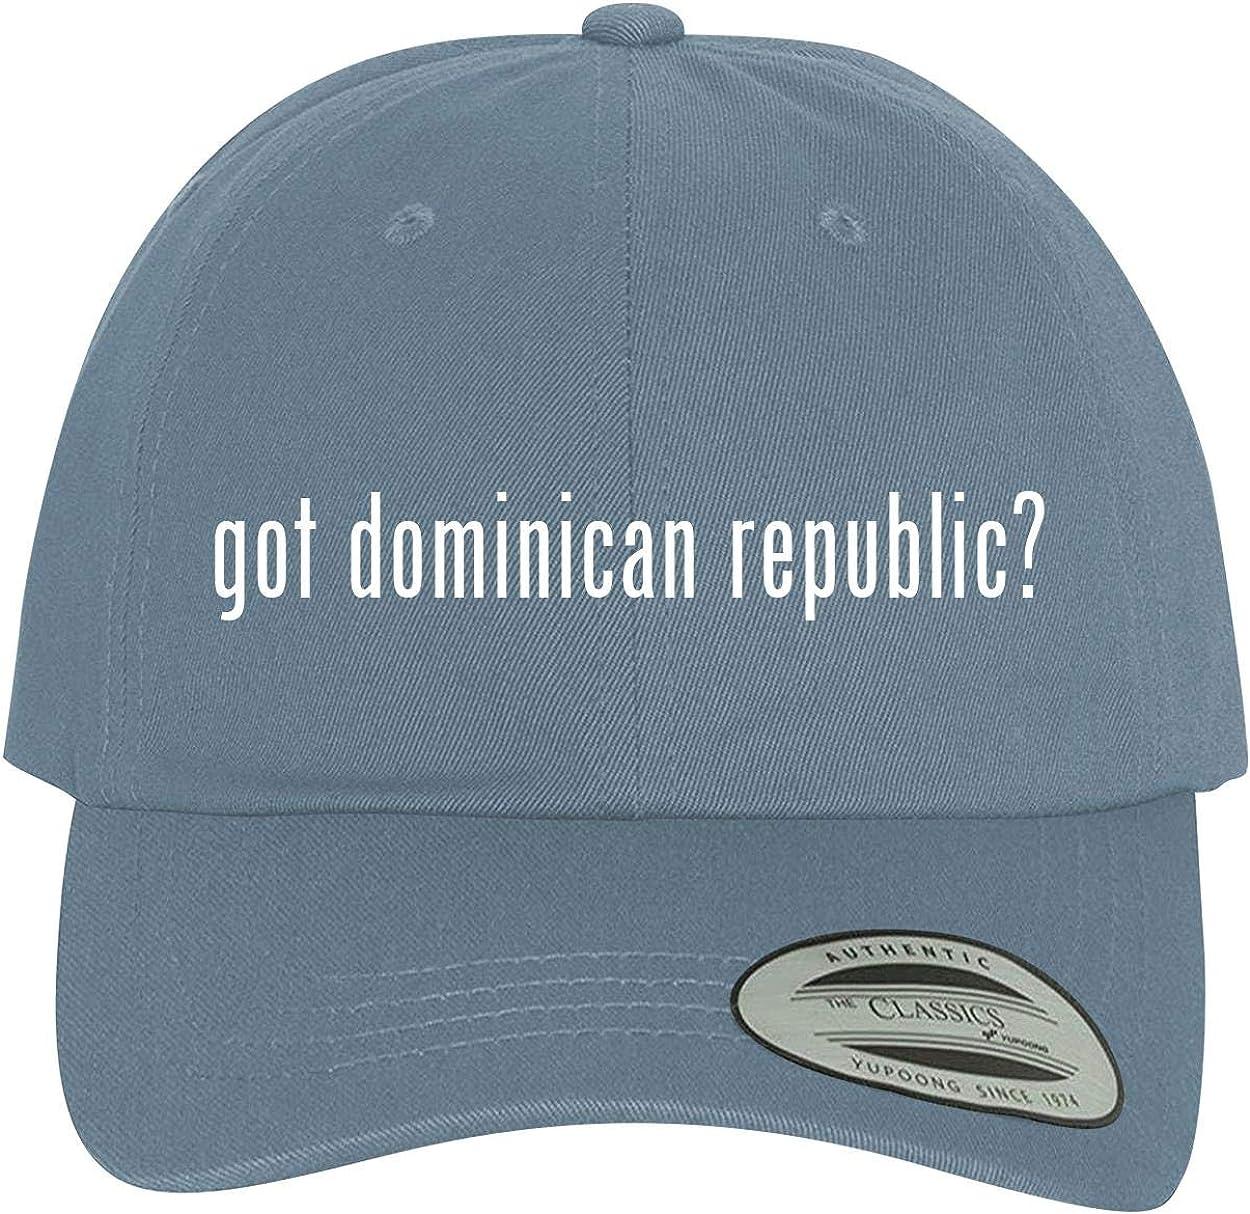 Comfortable Dad Hat Baseball Cap BH Cool Designs got Dominican Republic?